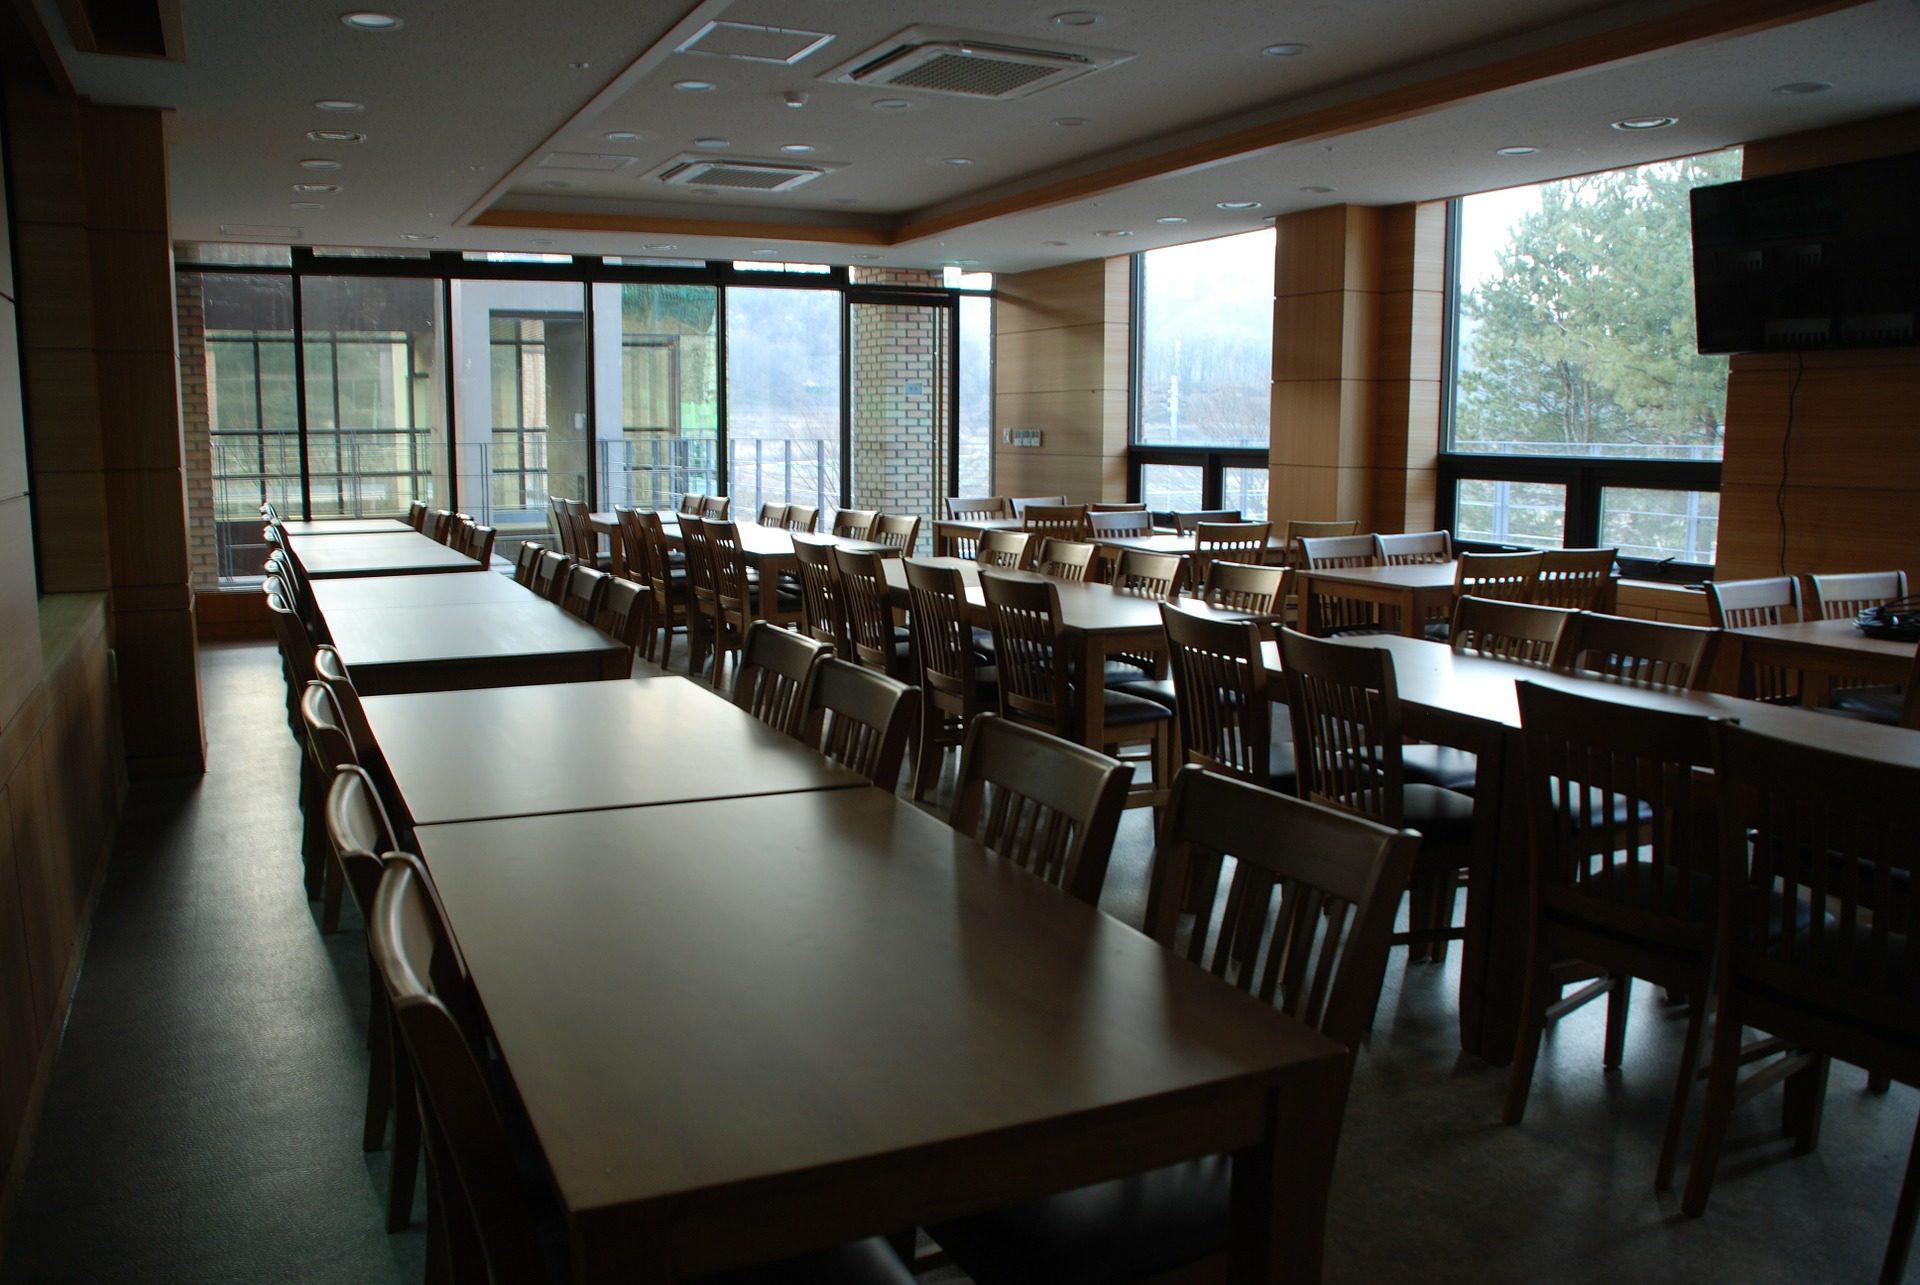 cafeteria-544871_1920.jpg